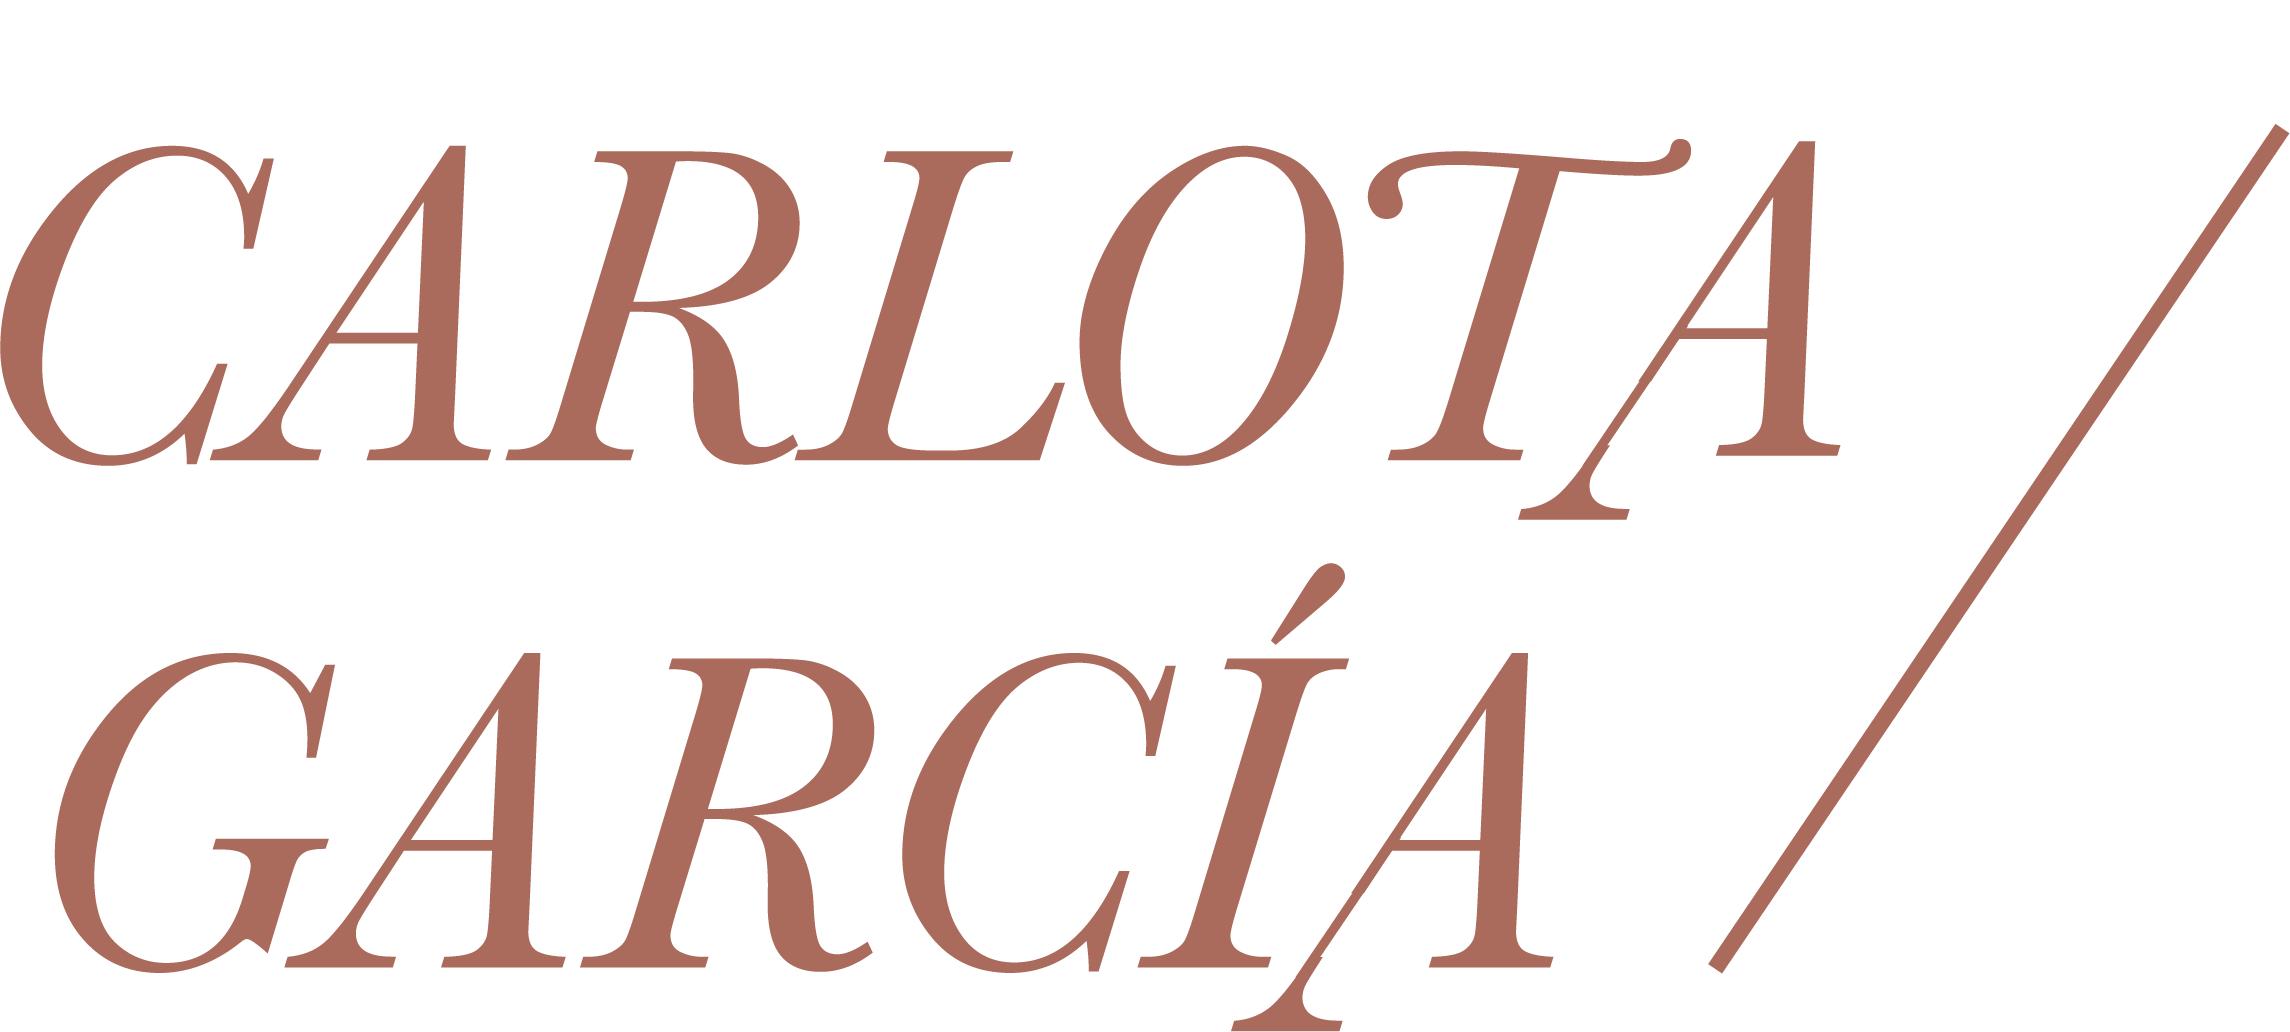 Carlota García Logo